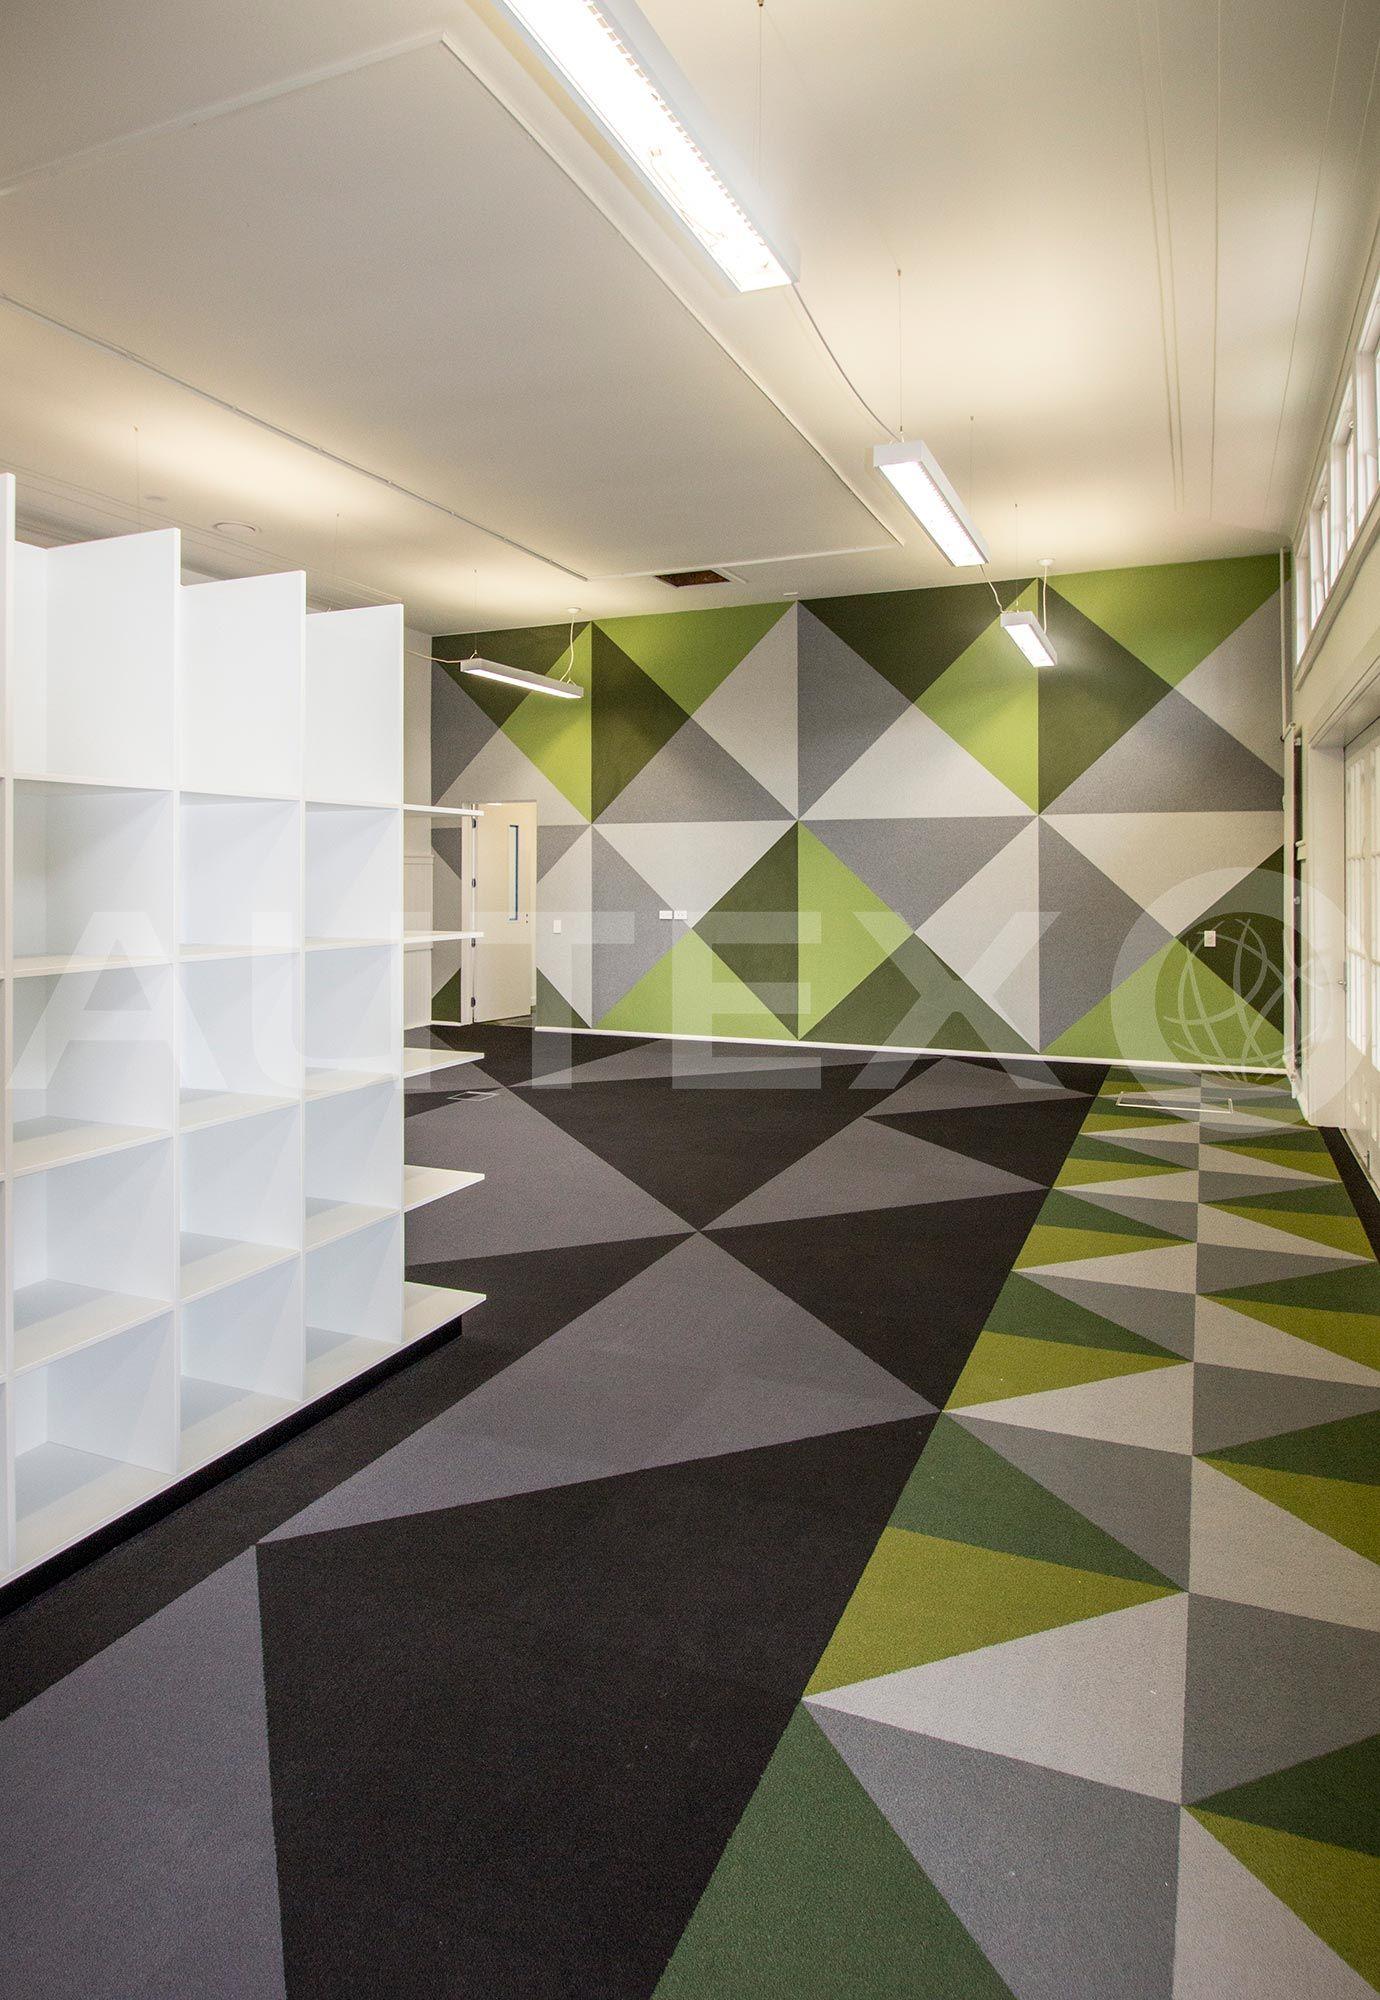 Autex acoustics symphony acoustic wallcovering whakawerawera school nz custom cut design